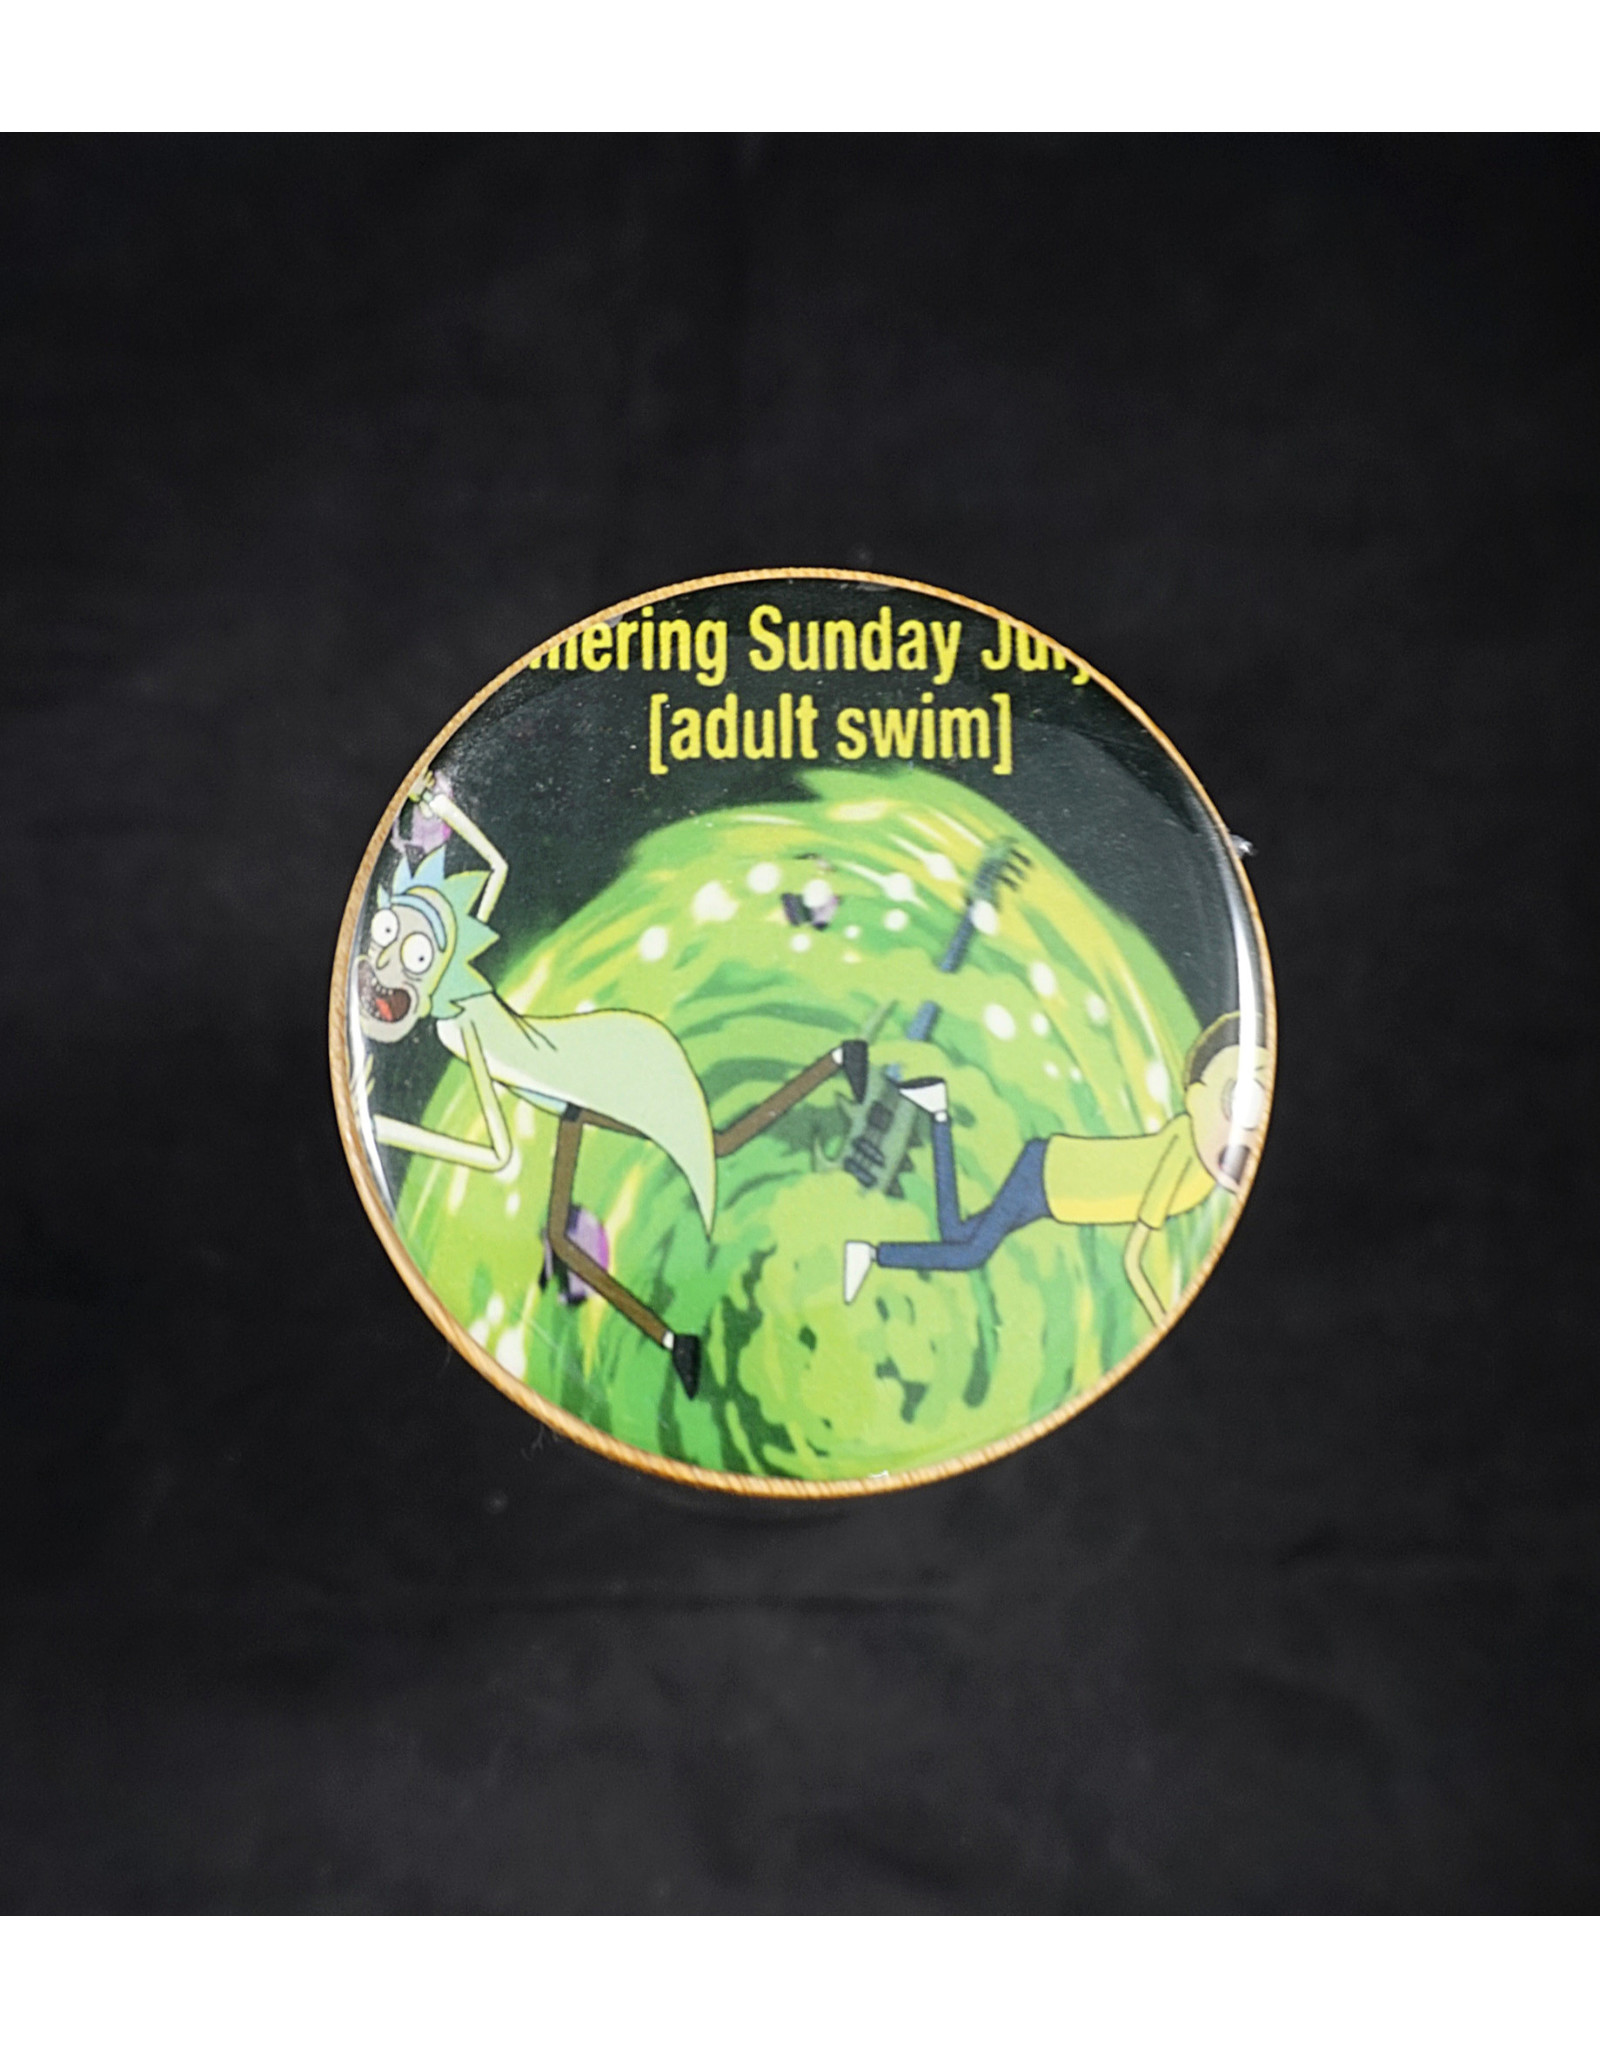 Rick and Morty Glass Jars Medium -  Adult Swim